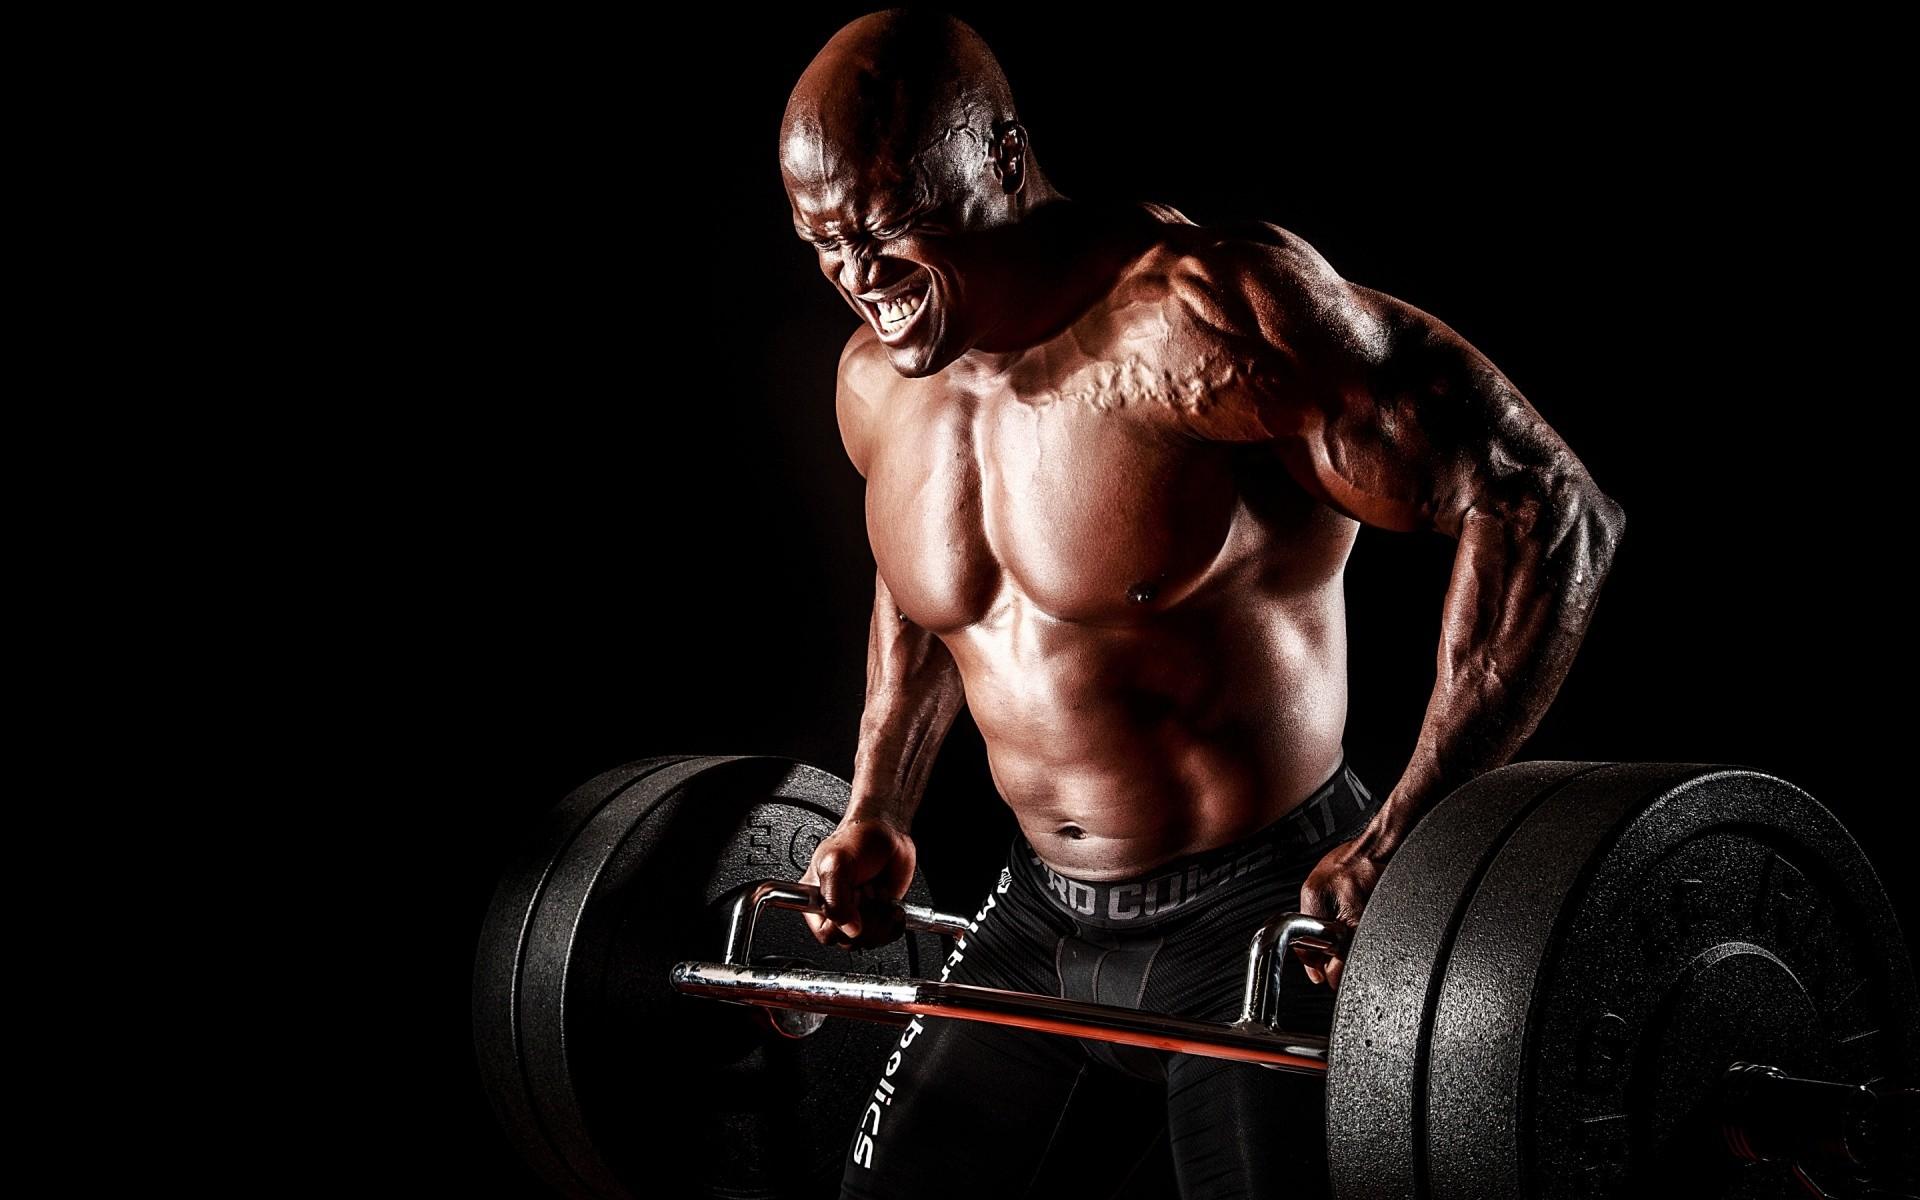 Bodybuilder Big Muscle Desktop Wallpaper Uploaded by 10Mantra